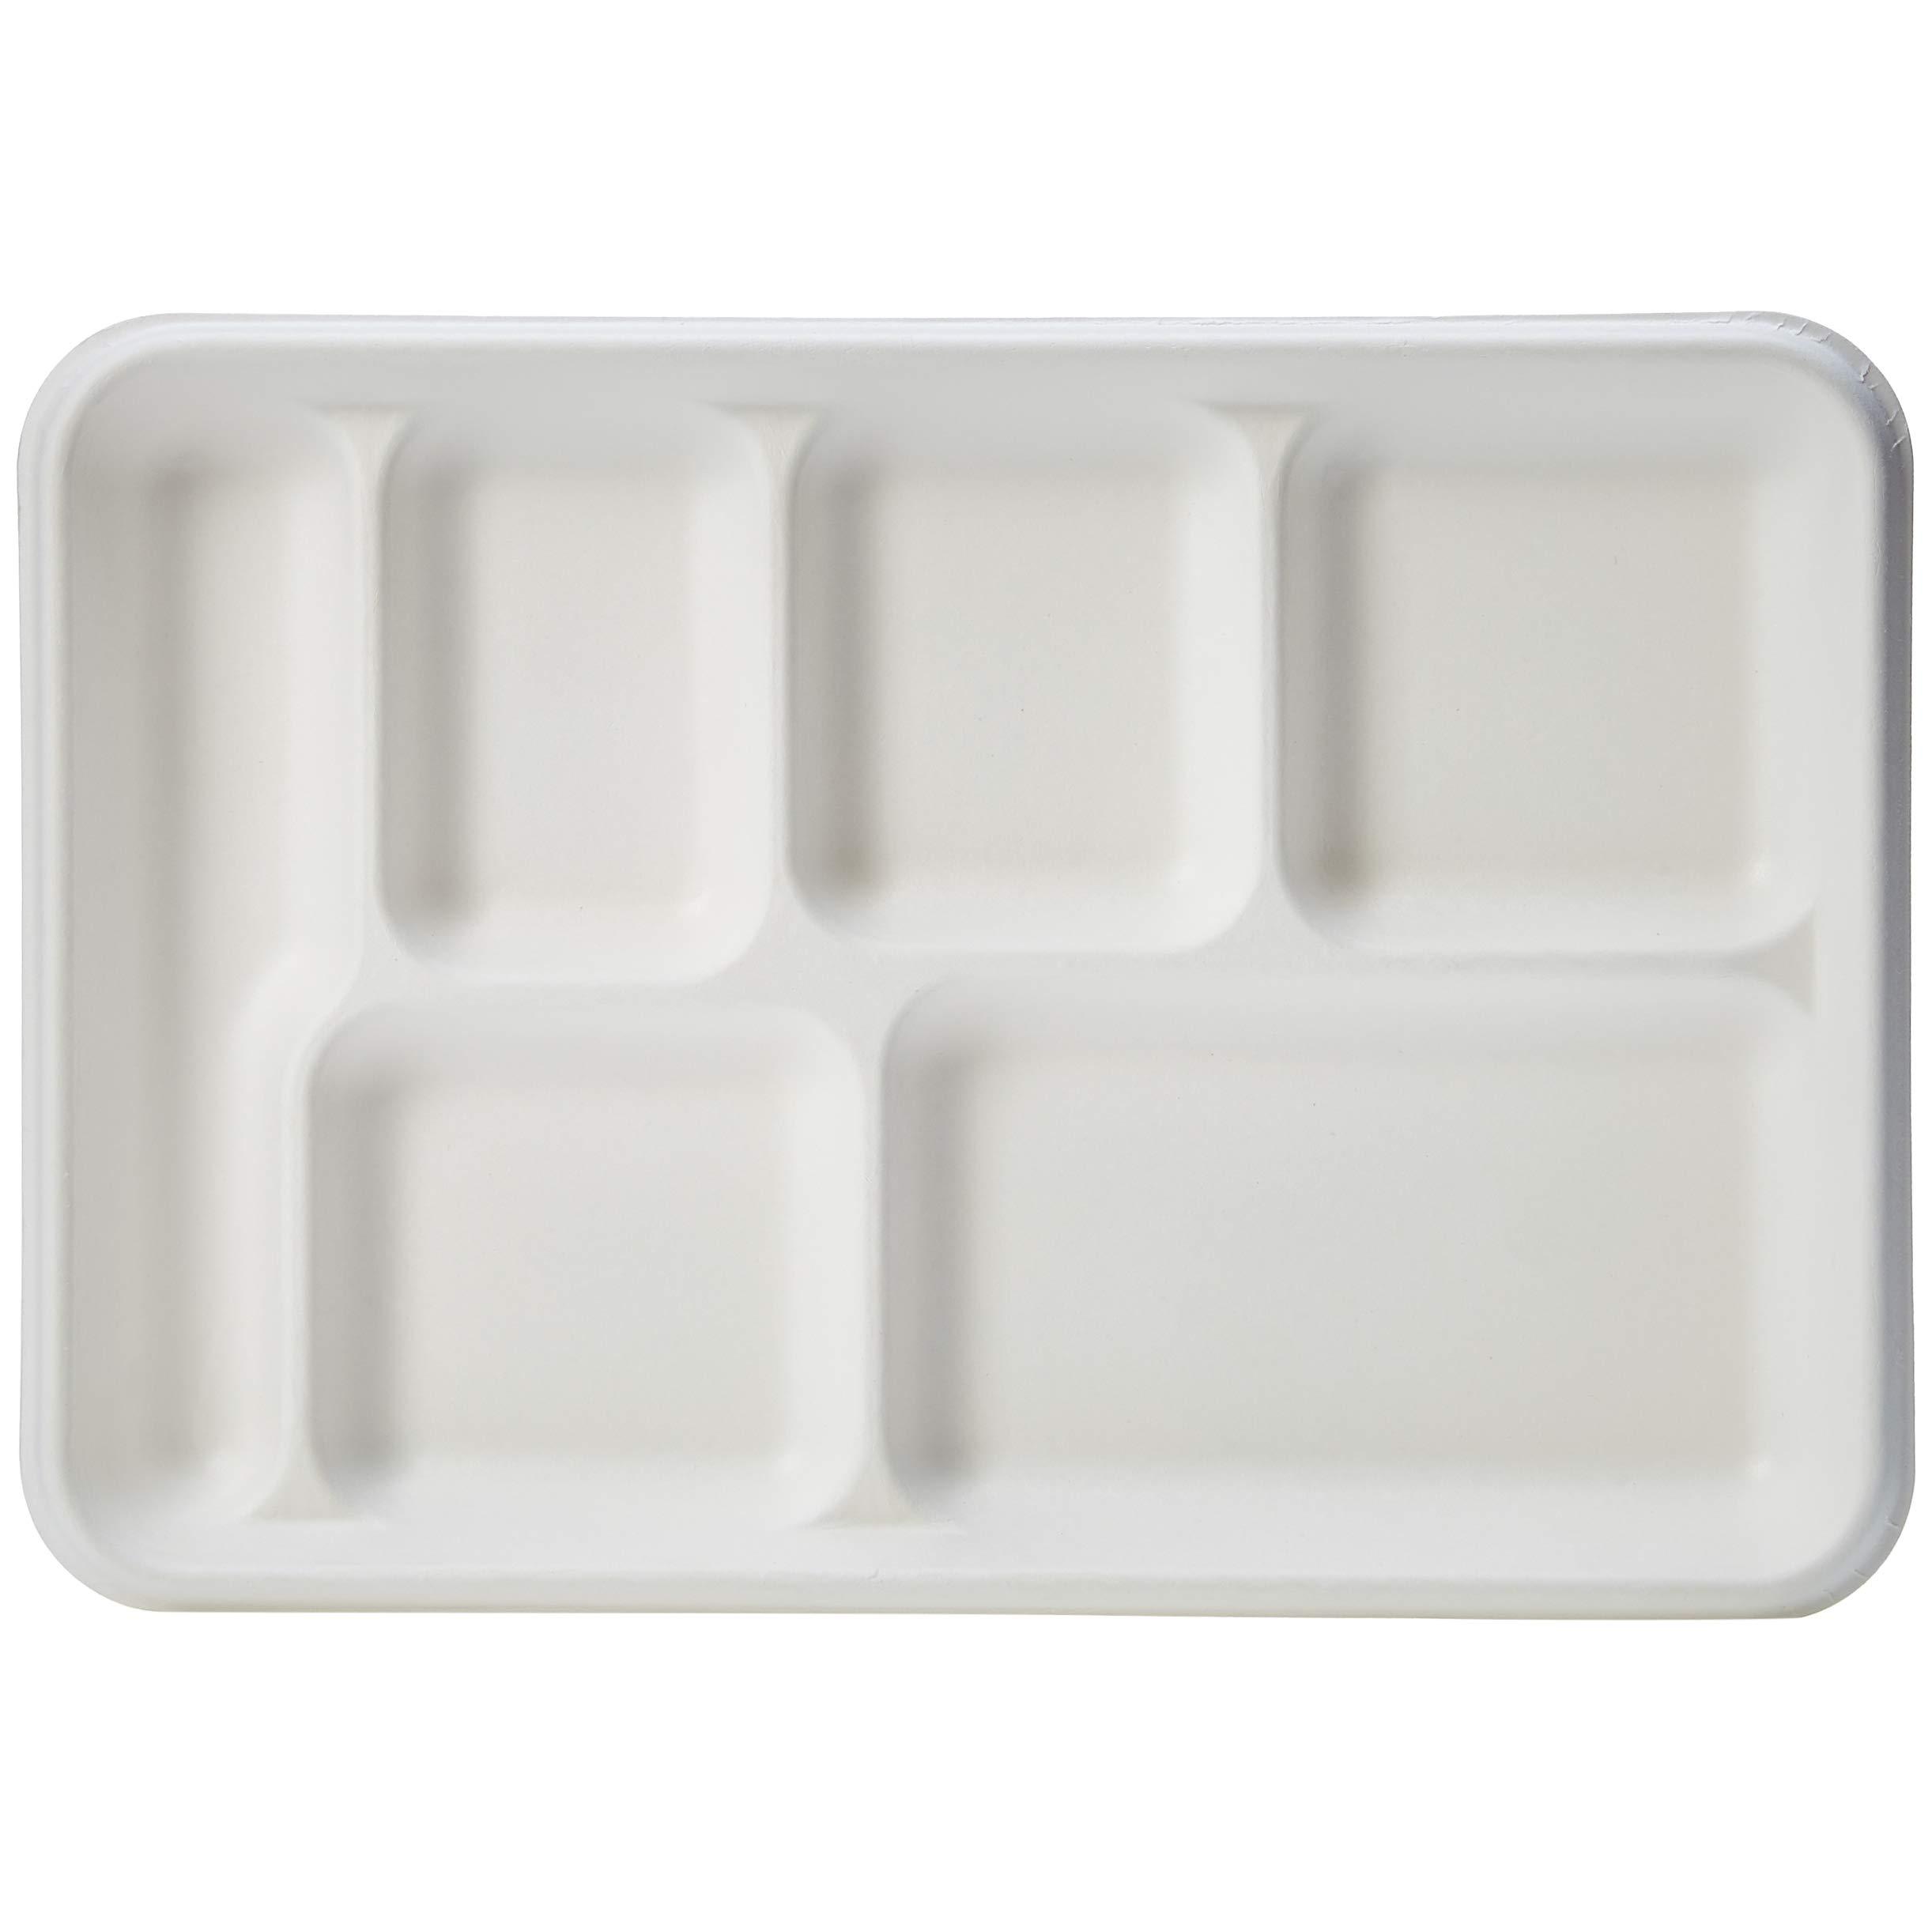 AmazonBasics Compostable Tray, 6-Compartment, 12.7 x 8.7 x 1 Inches, 250 Trays by AmazonBasics